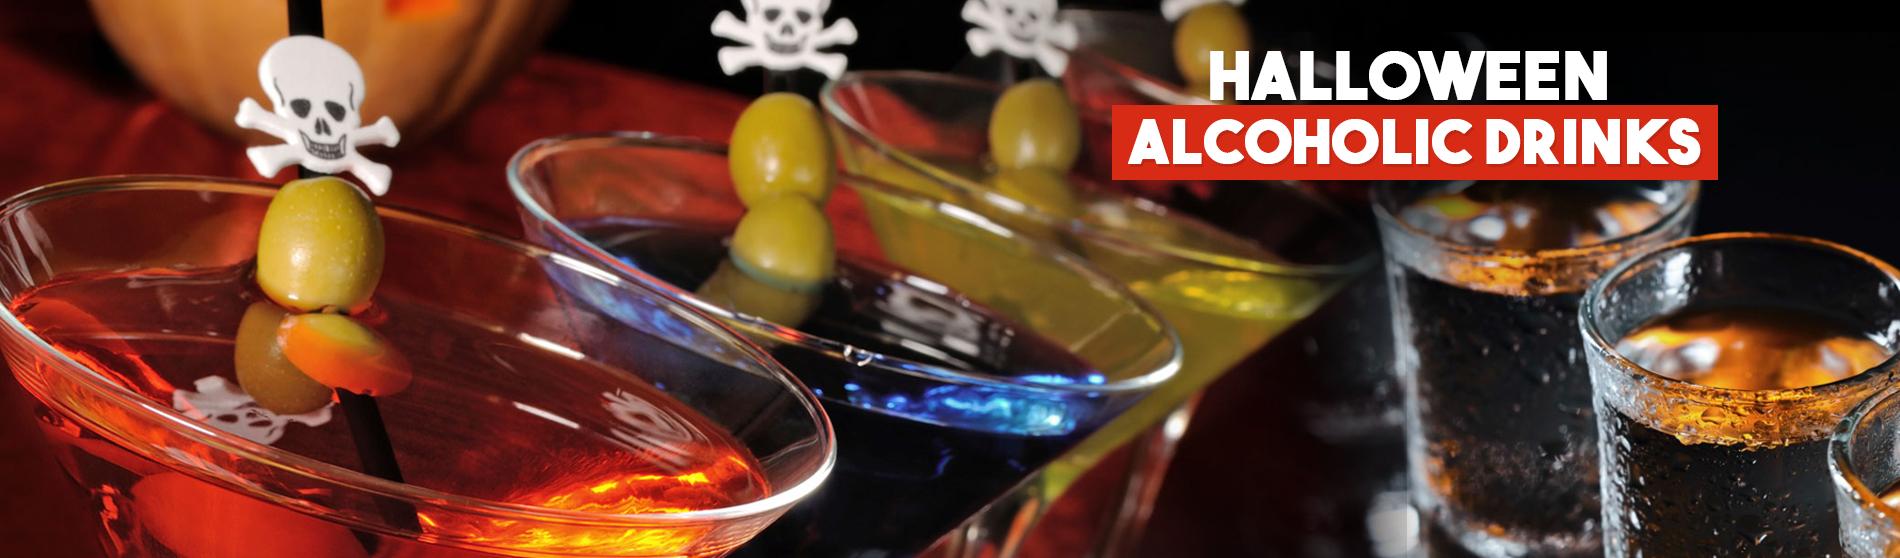 Halloween-Alcoholic-Drinks